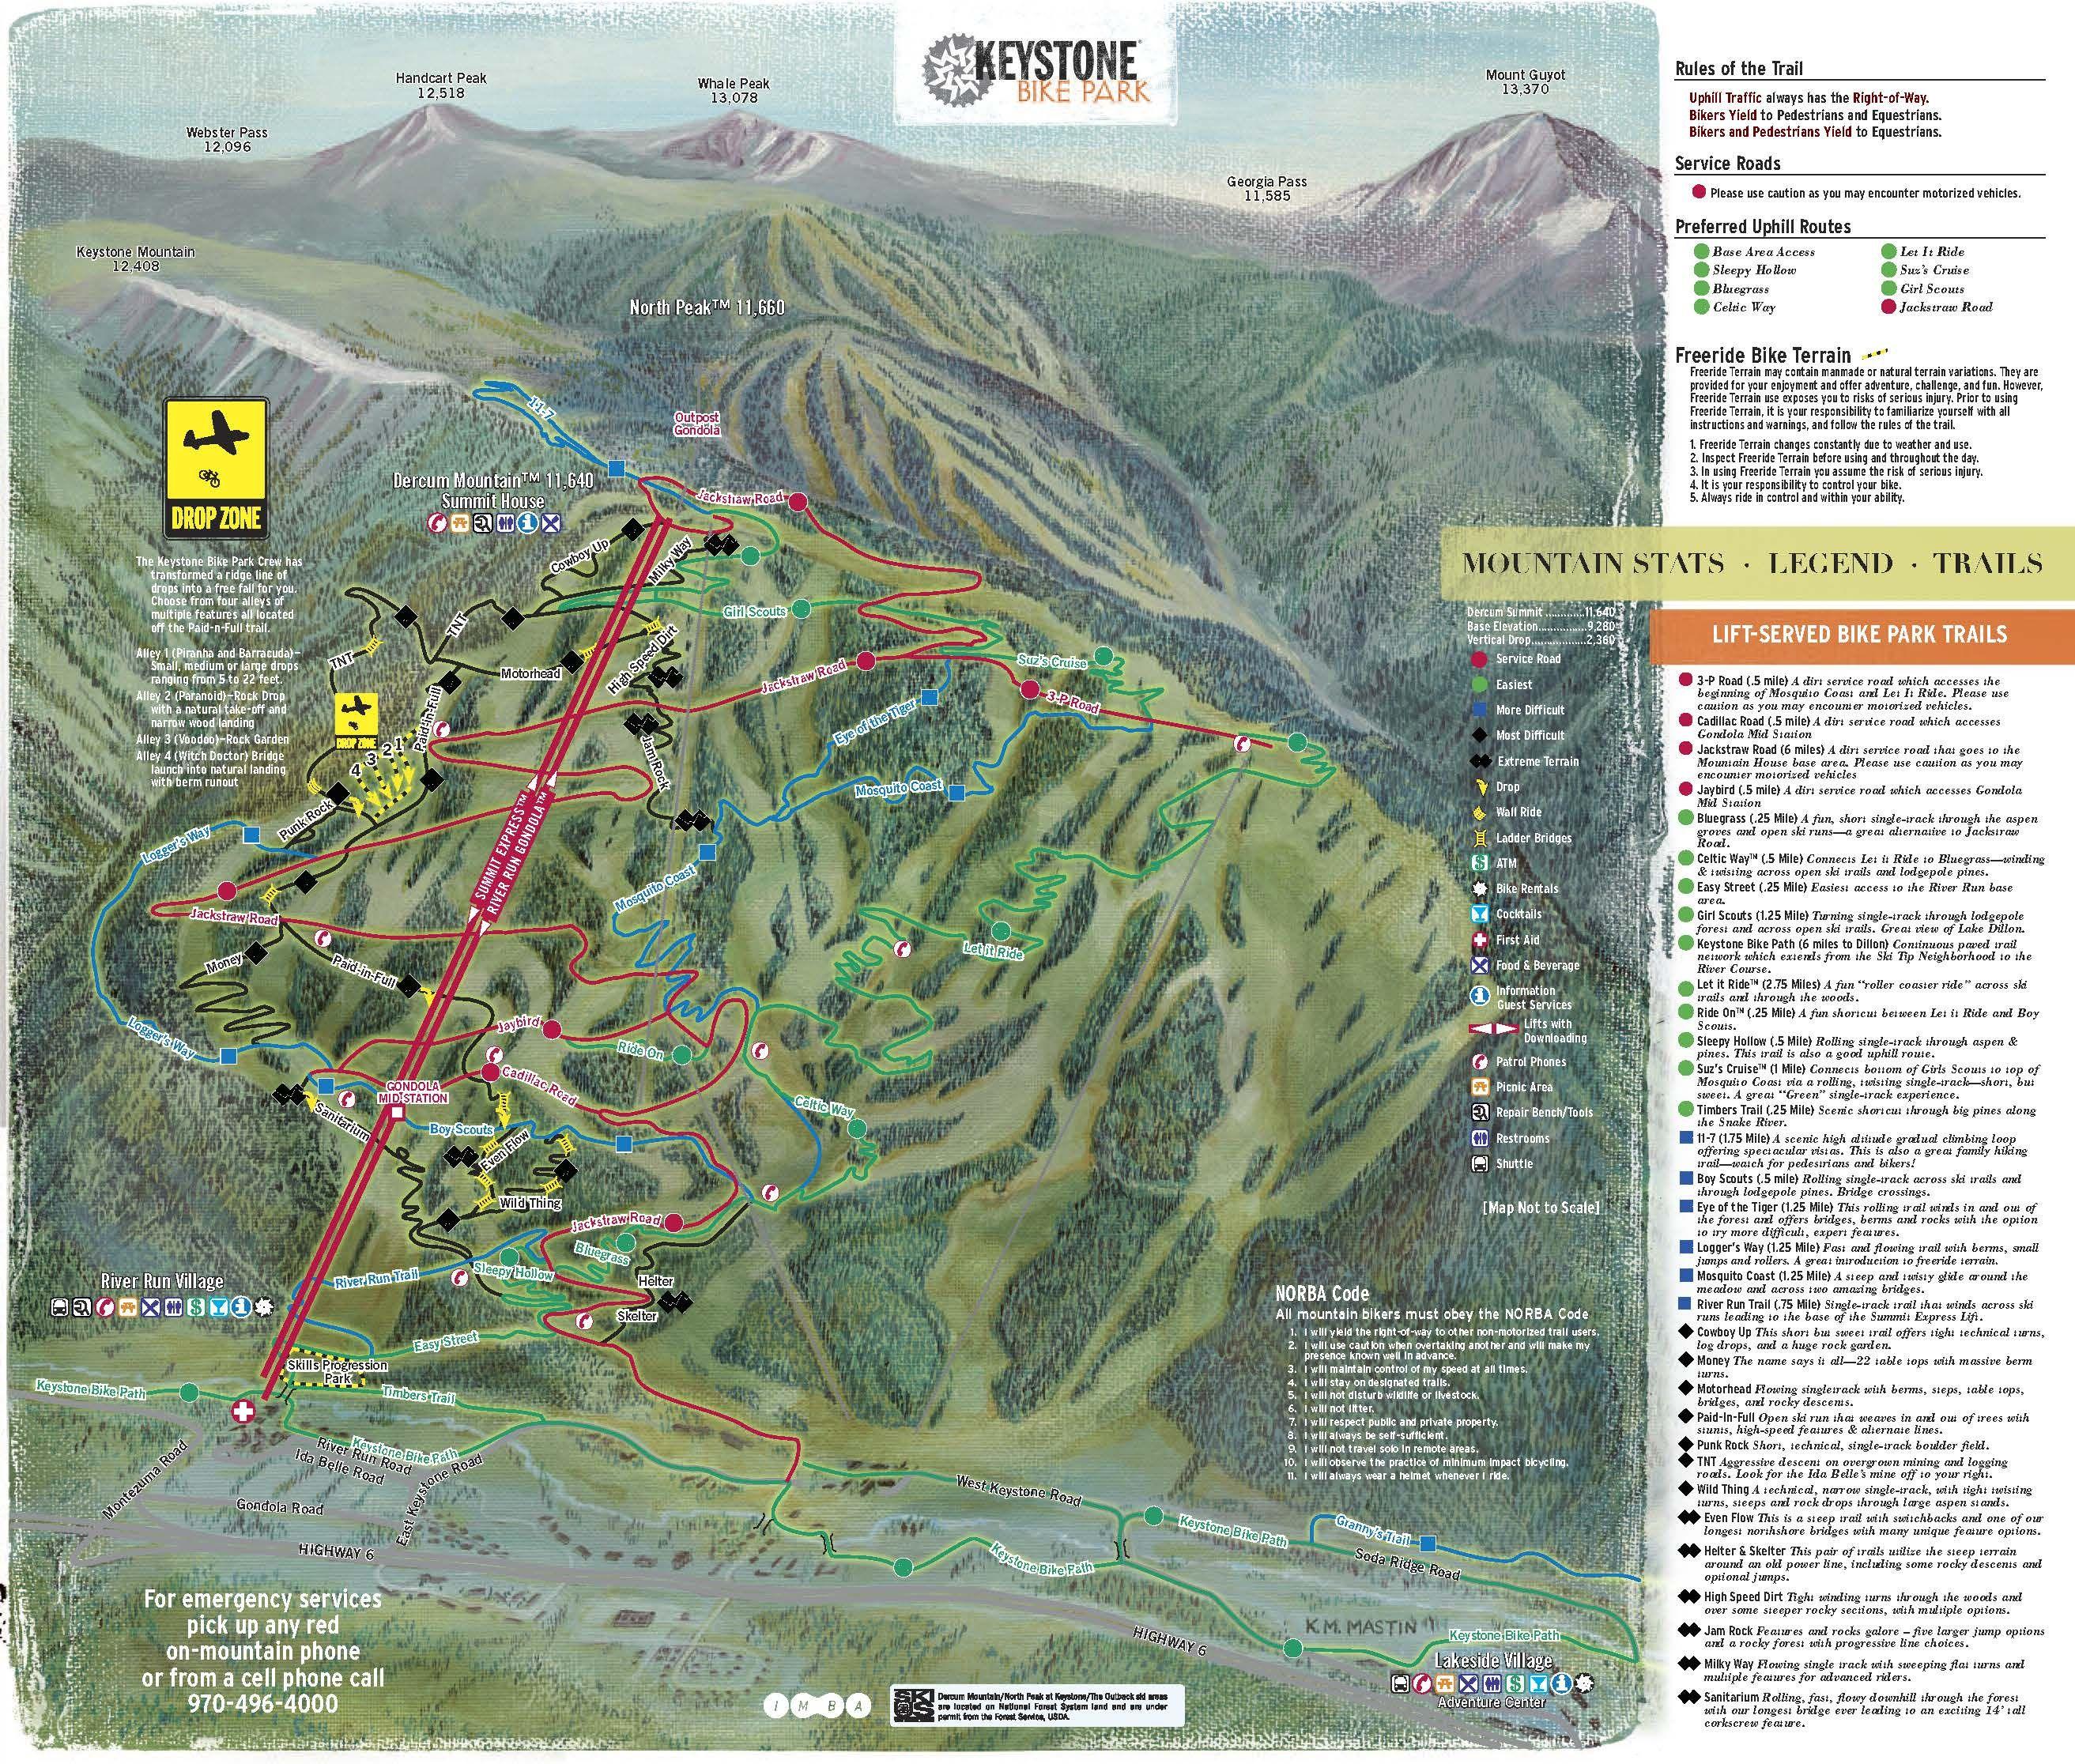 Keystone Downhill Bike Trail Map Bike Trails Ski Town Park Trails